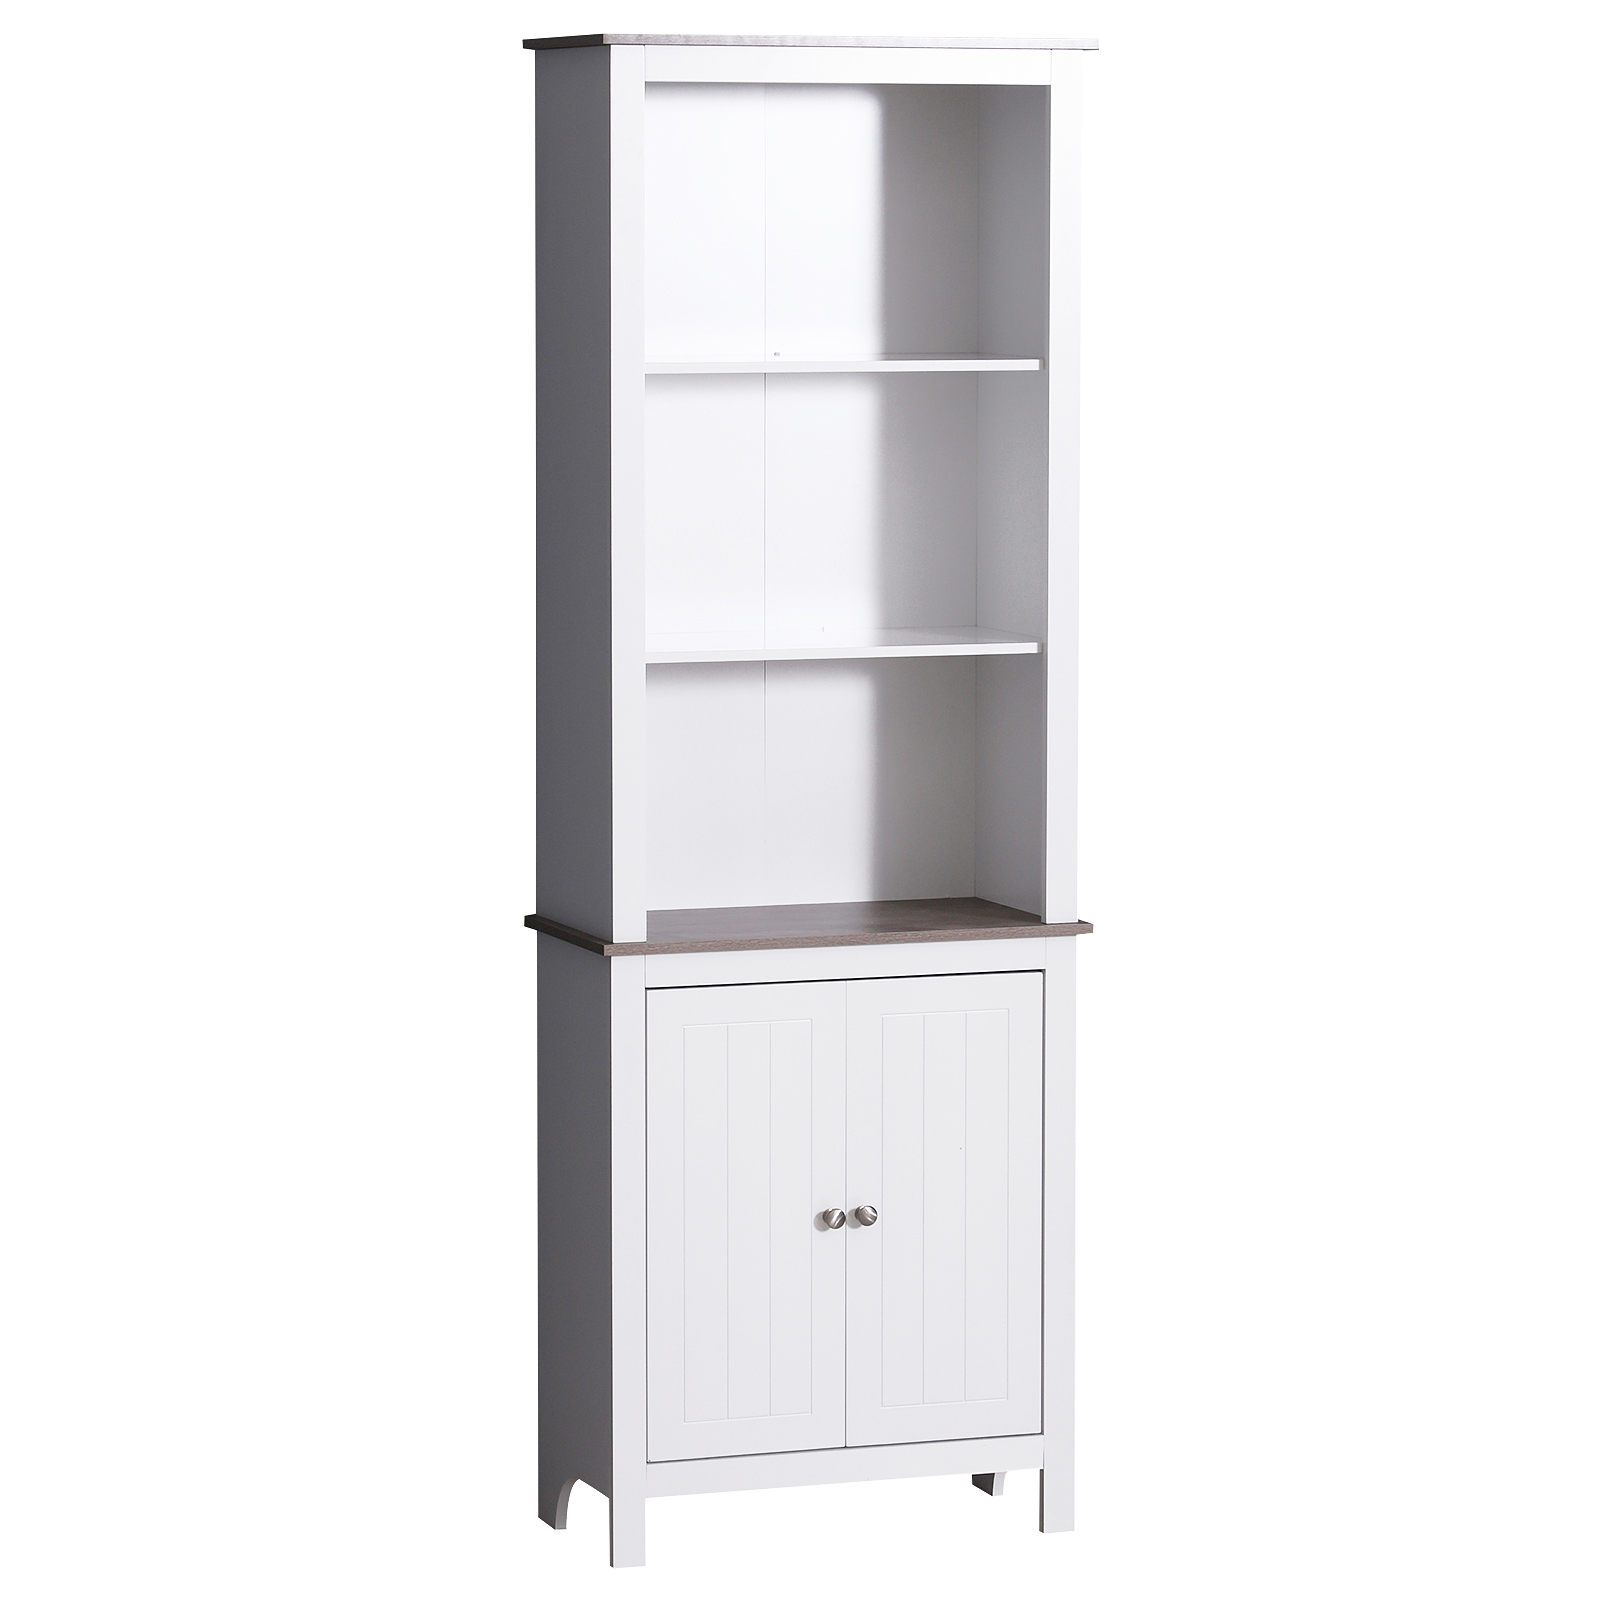 Homcom 69 Wood Free Standing Bathroom Linen Tower Storage Cabinet White Walmart Com Walmart Com